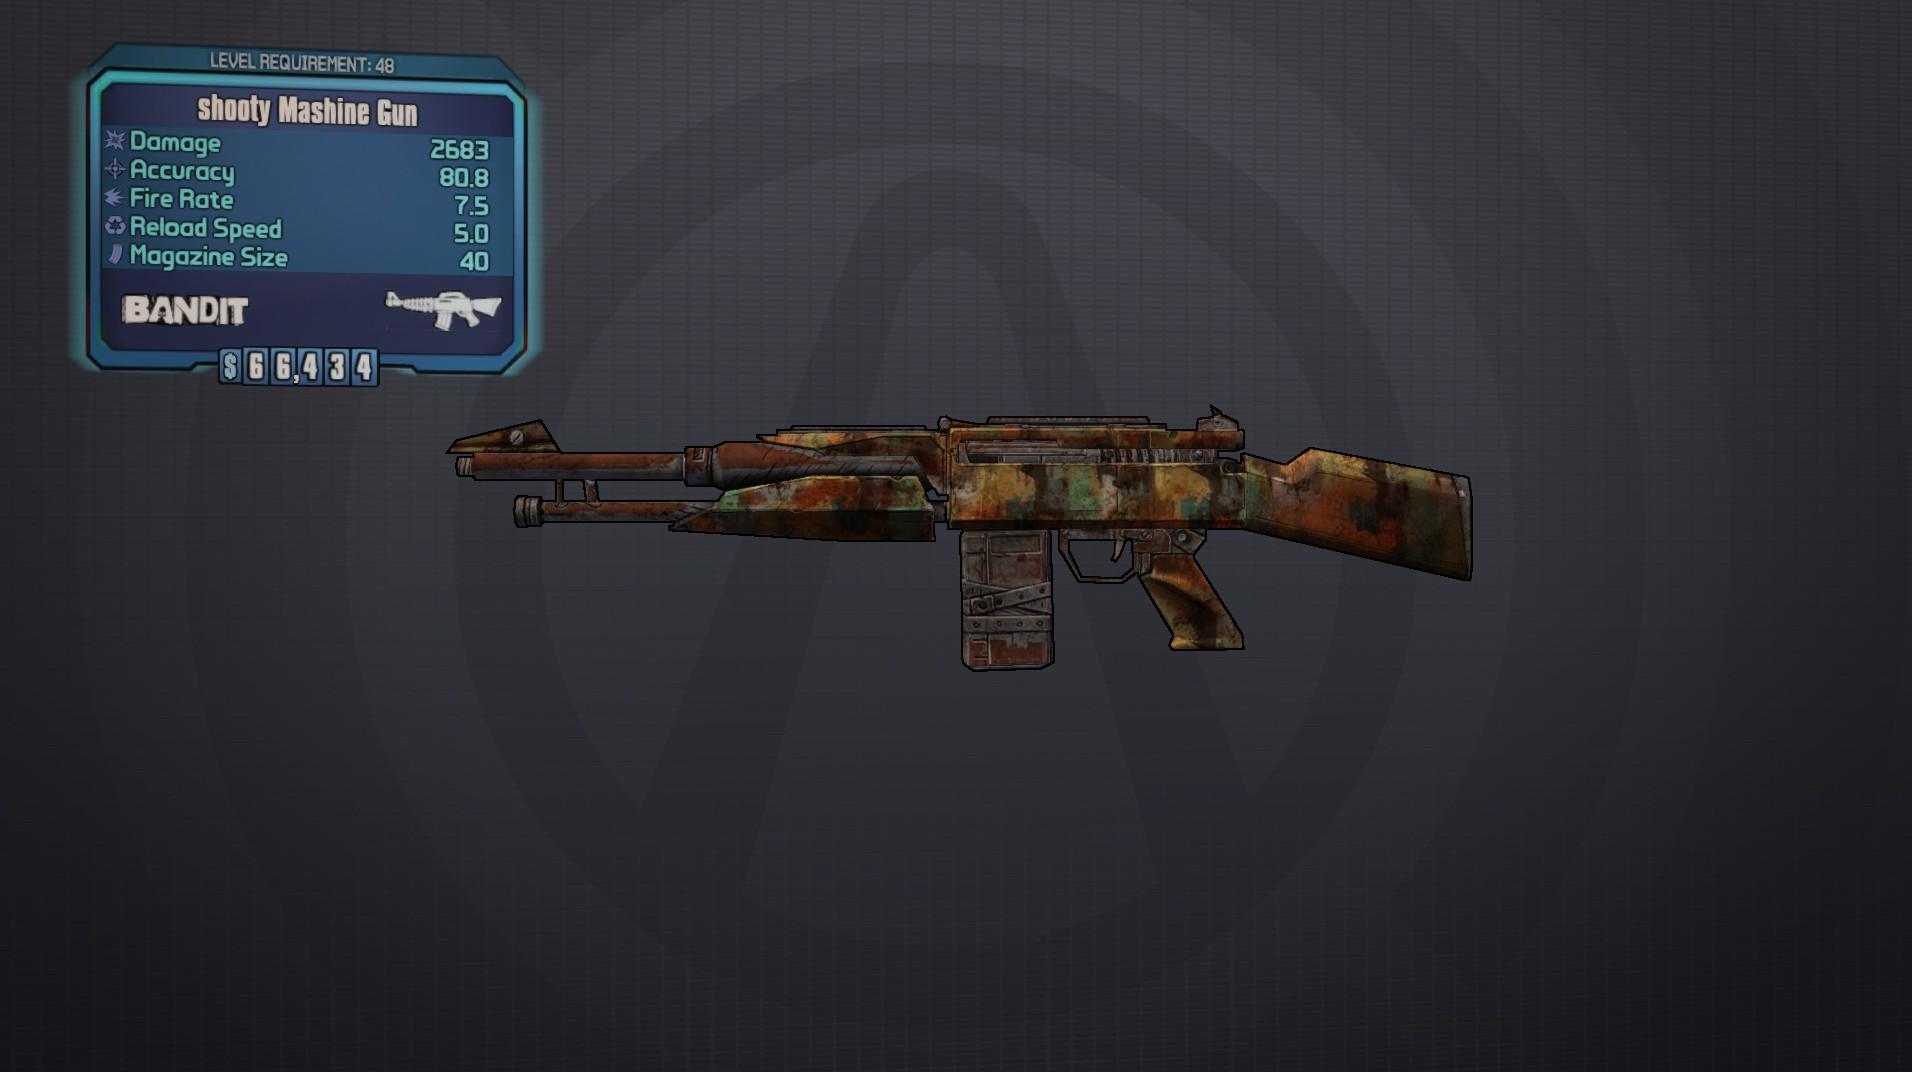 Mashine Gun | Borderlands Wiki | FANDOM powered by Wikia